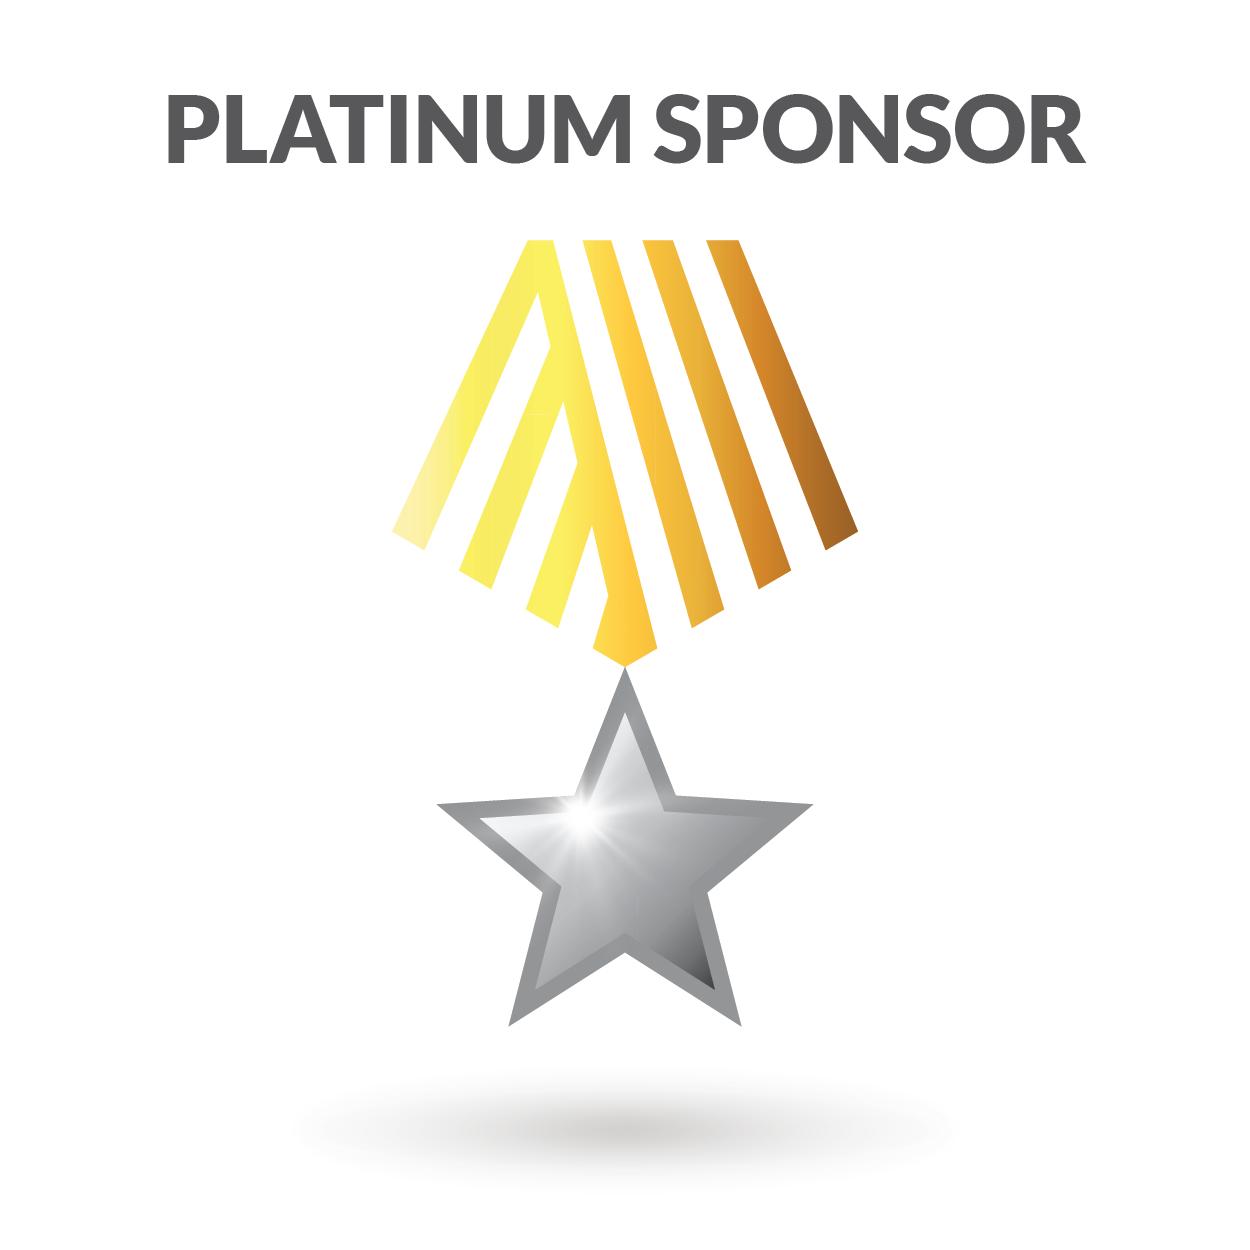 PLATINUM SPONSOR-01.png